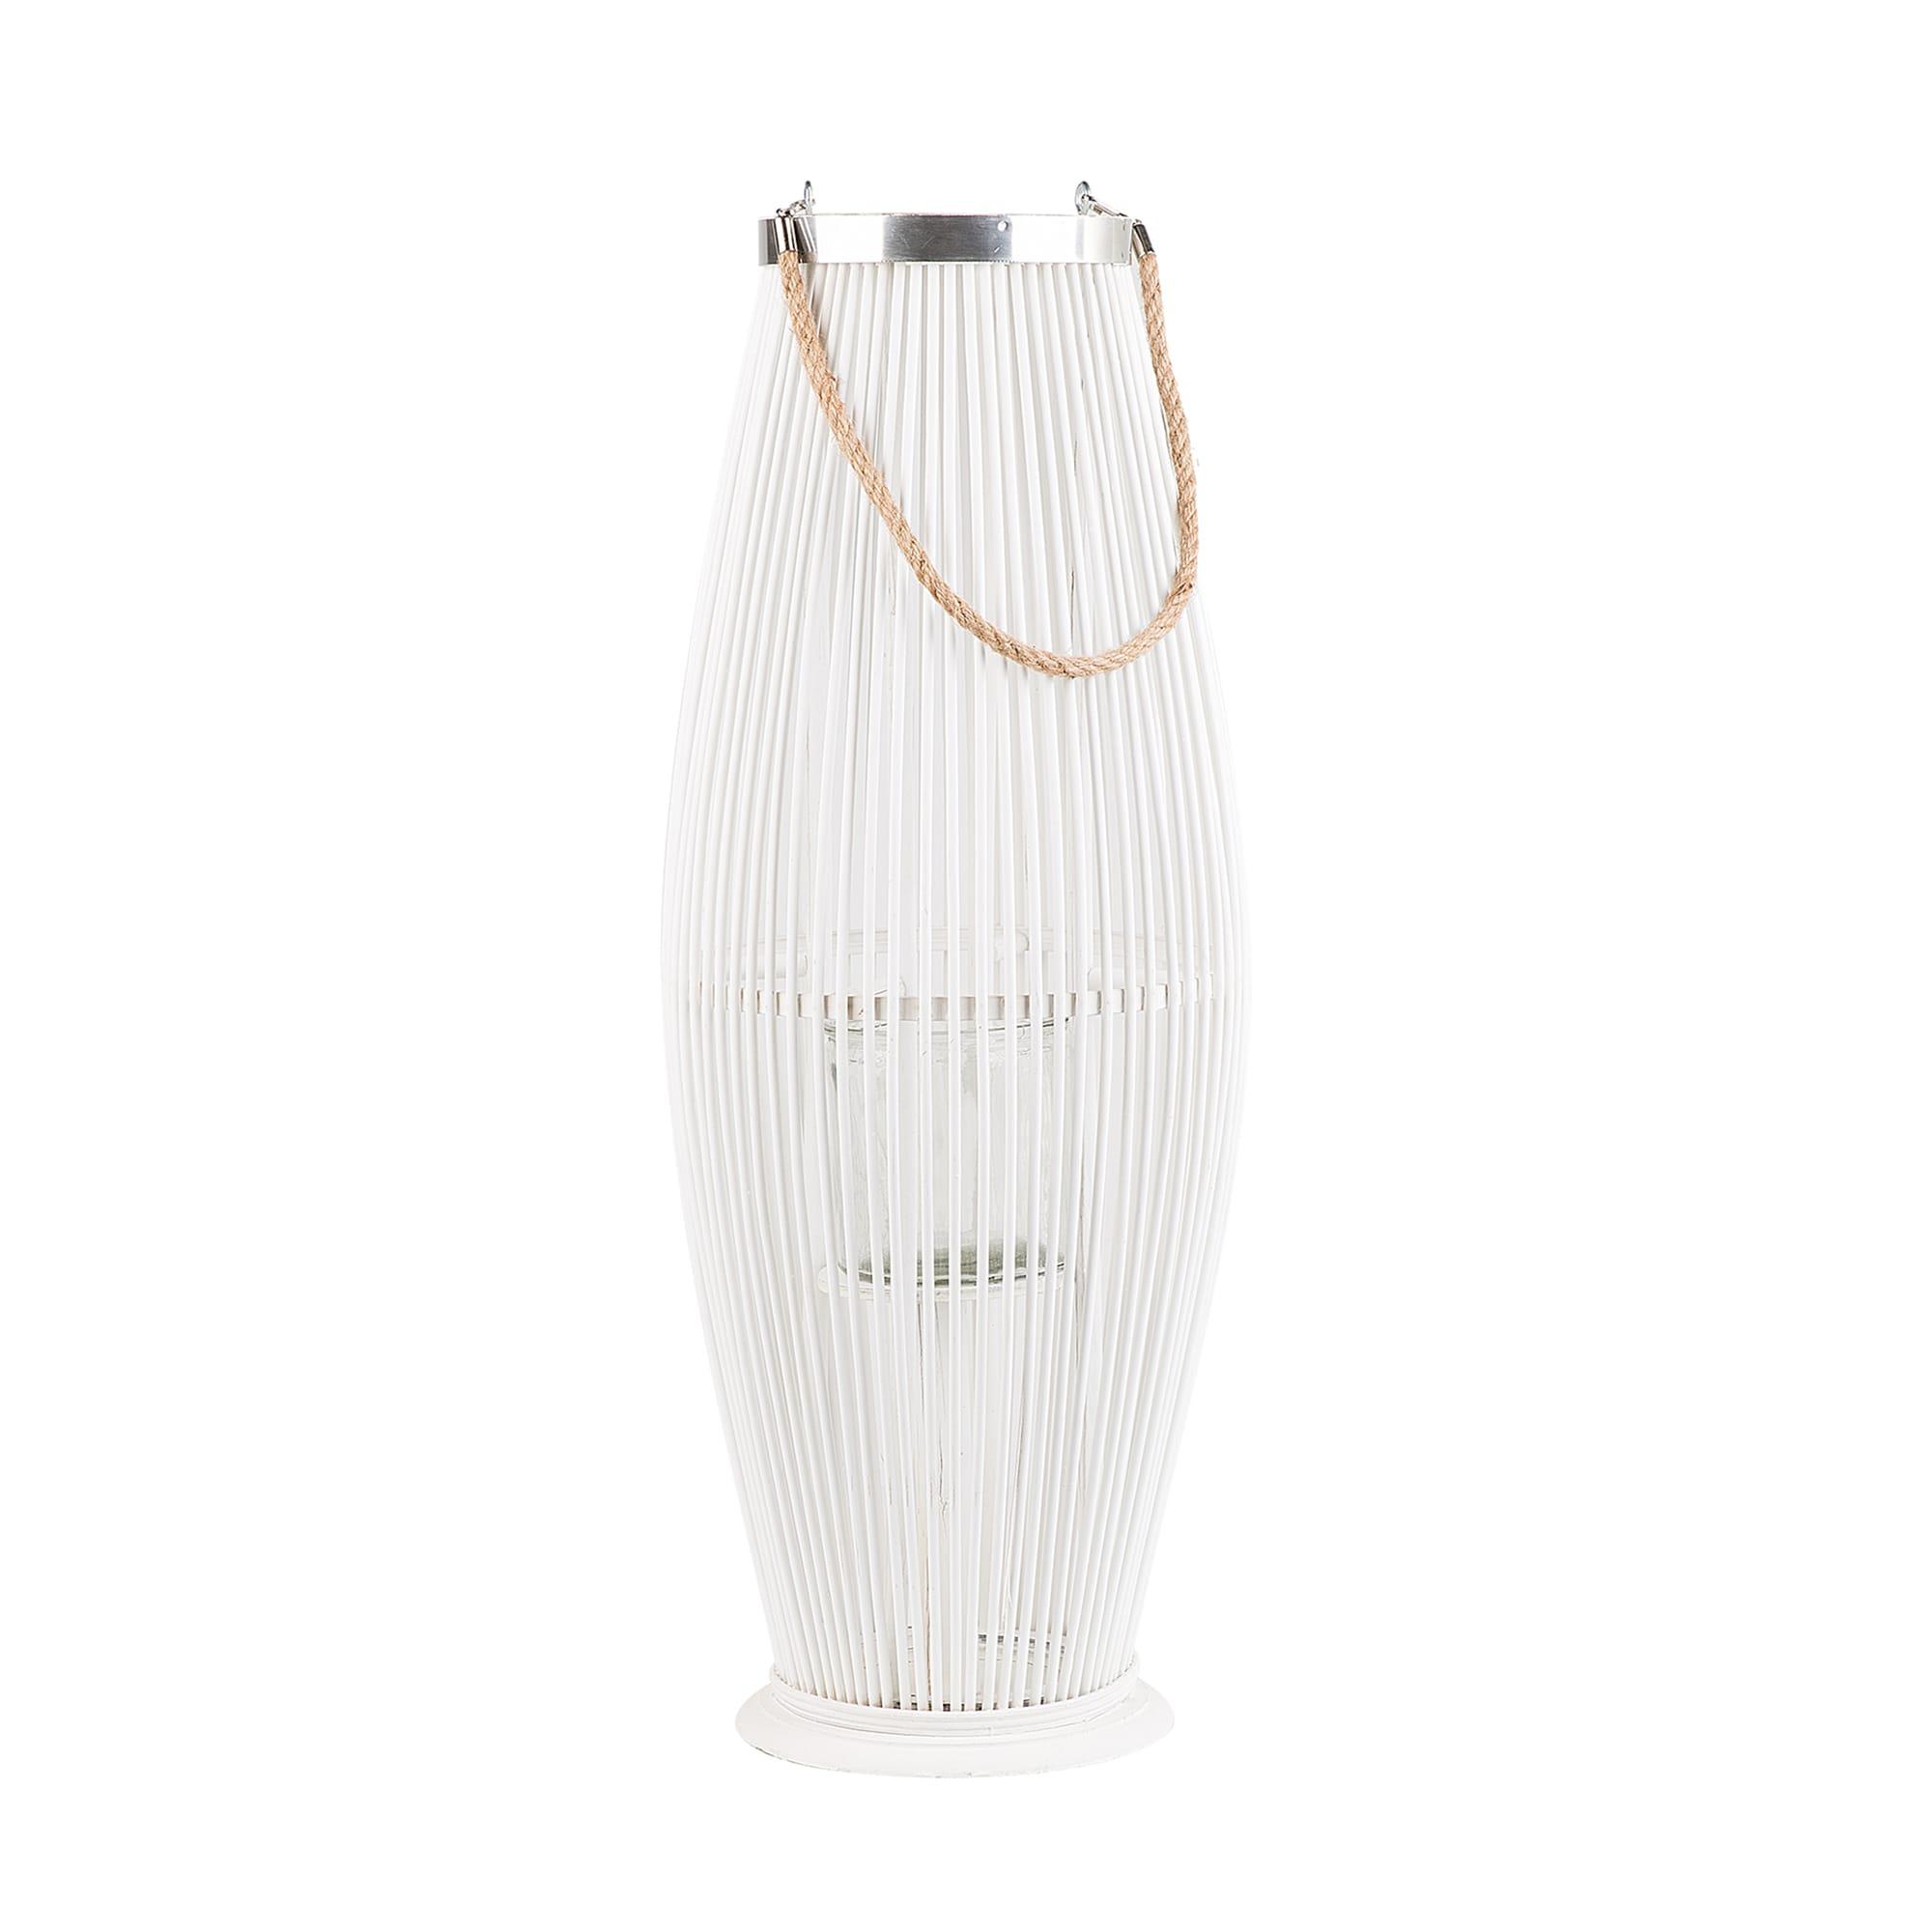 Lanterne blanche 84 cm